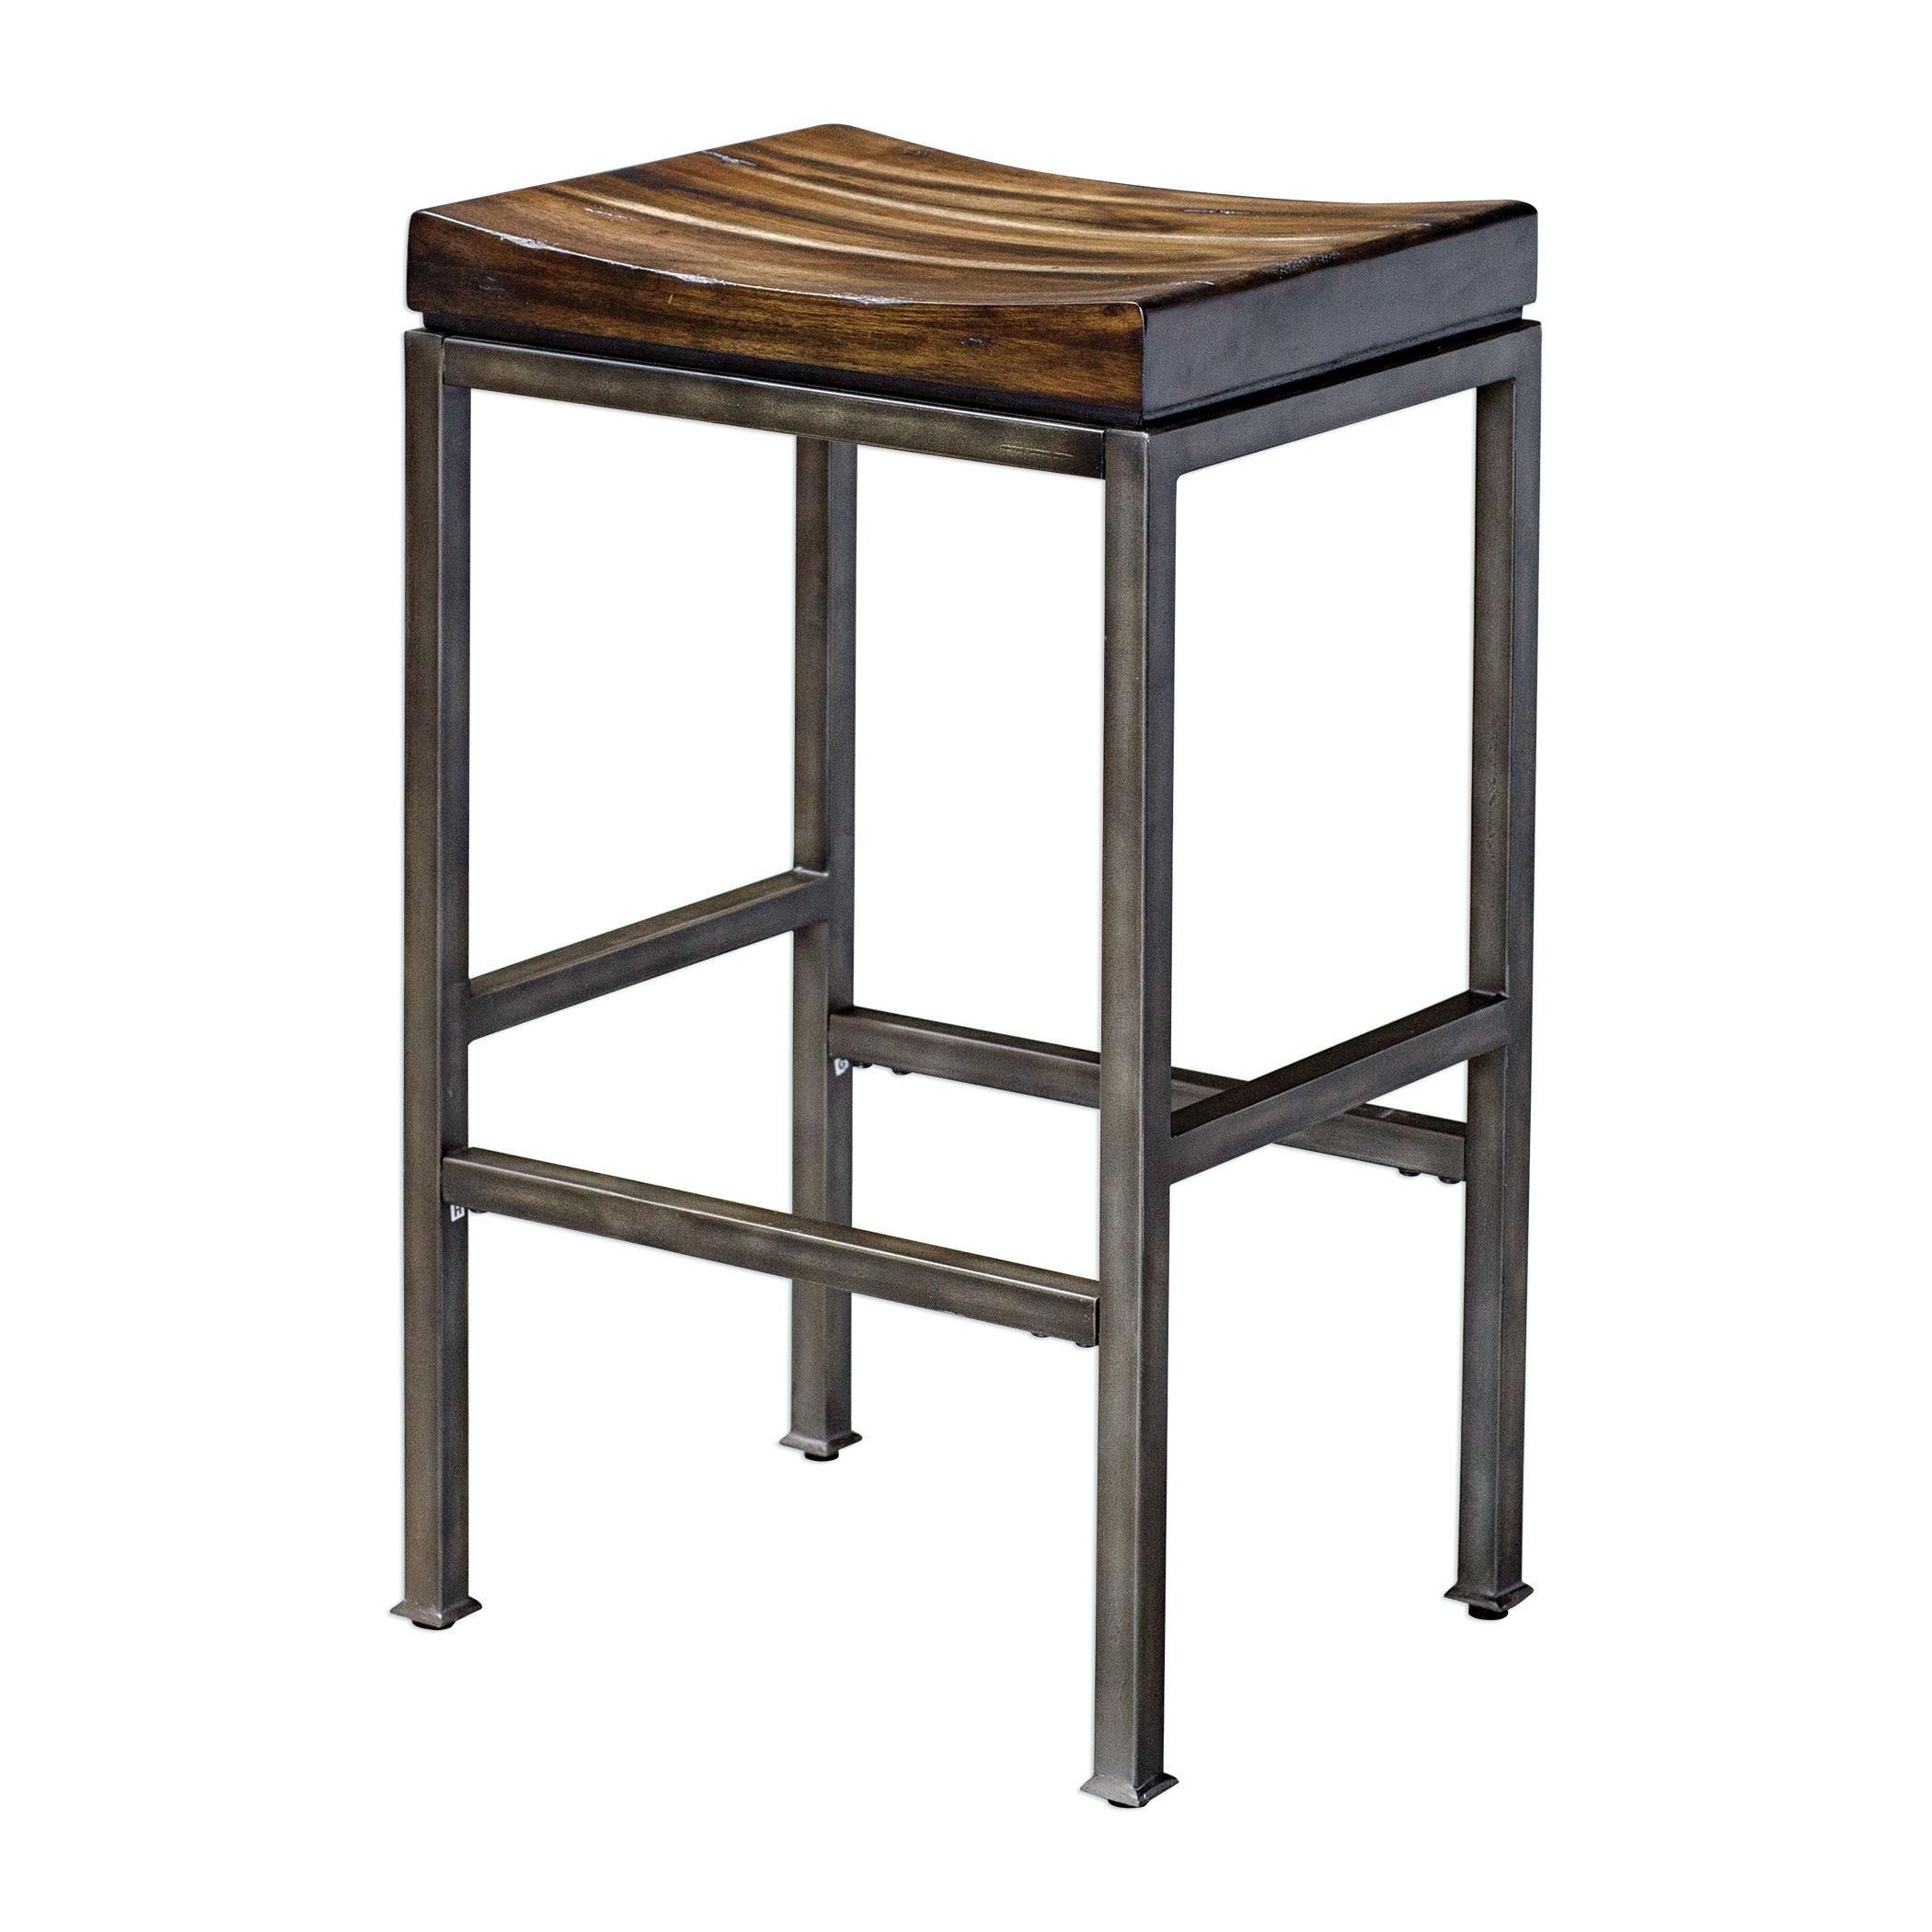 Uttermost Beck Industrial Bar Stool UT25893 From Walter E. Smithe Furniture  + Design